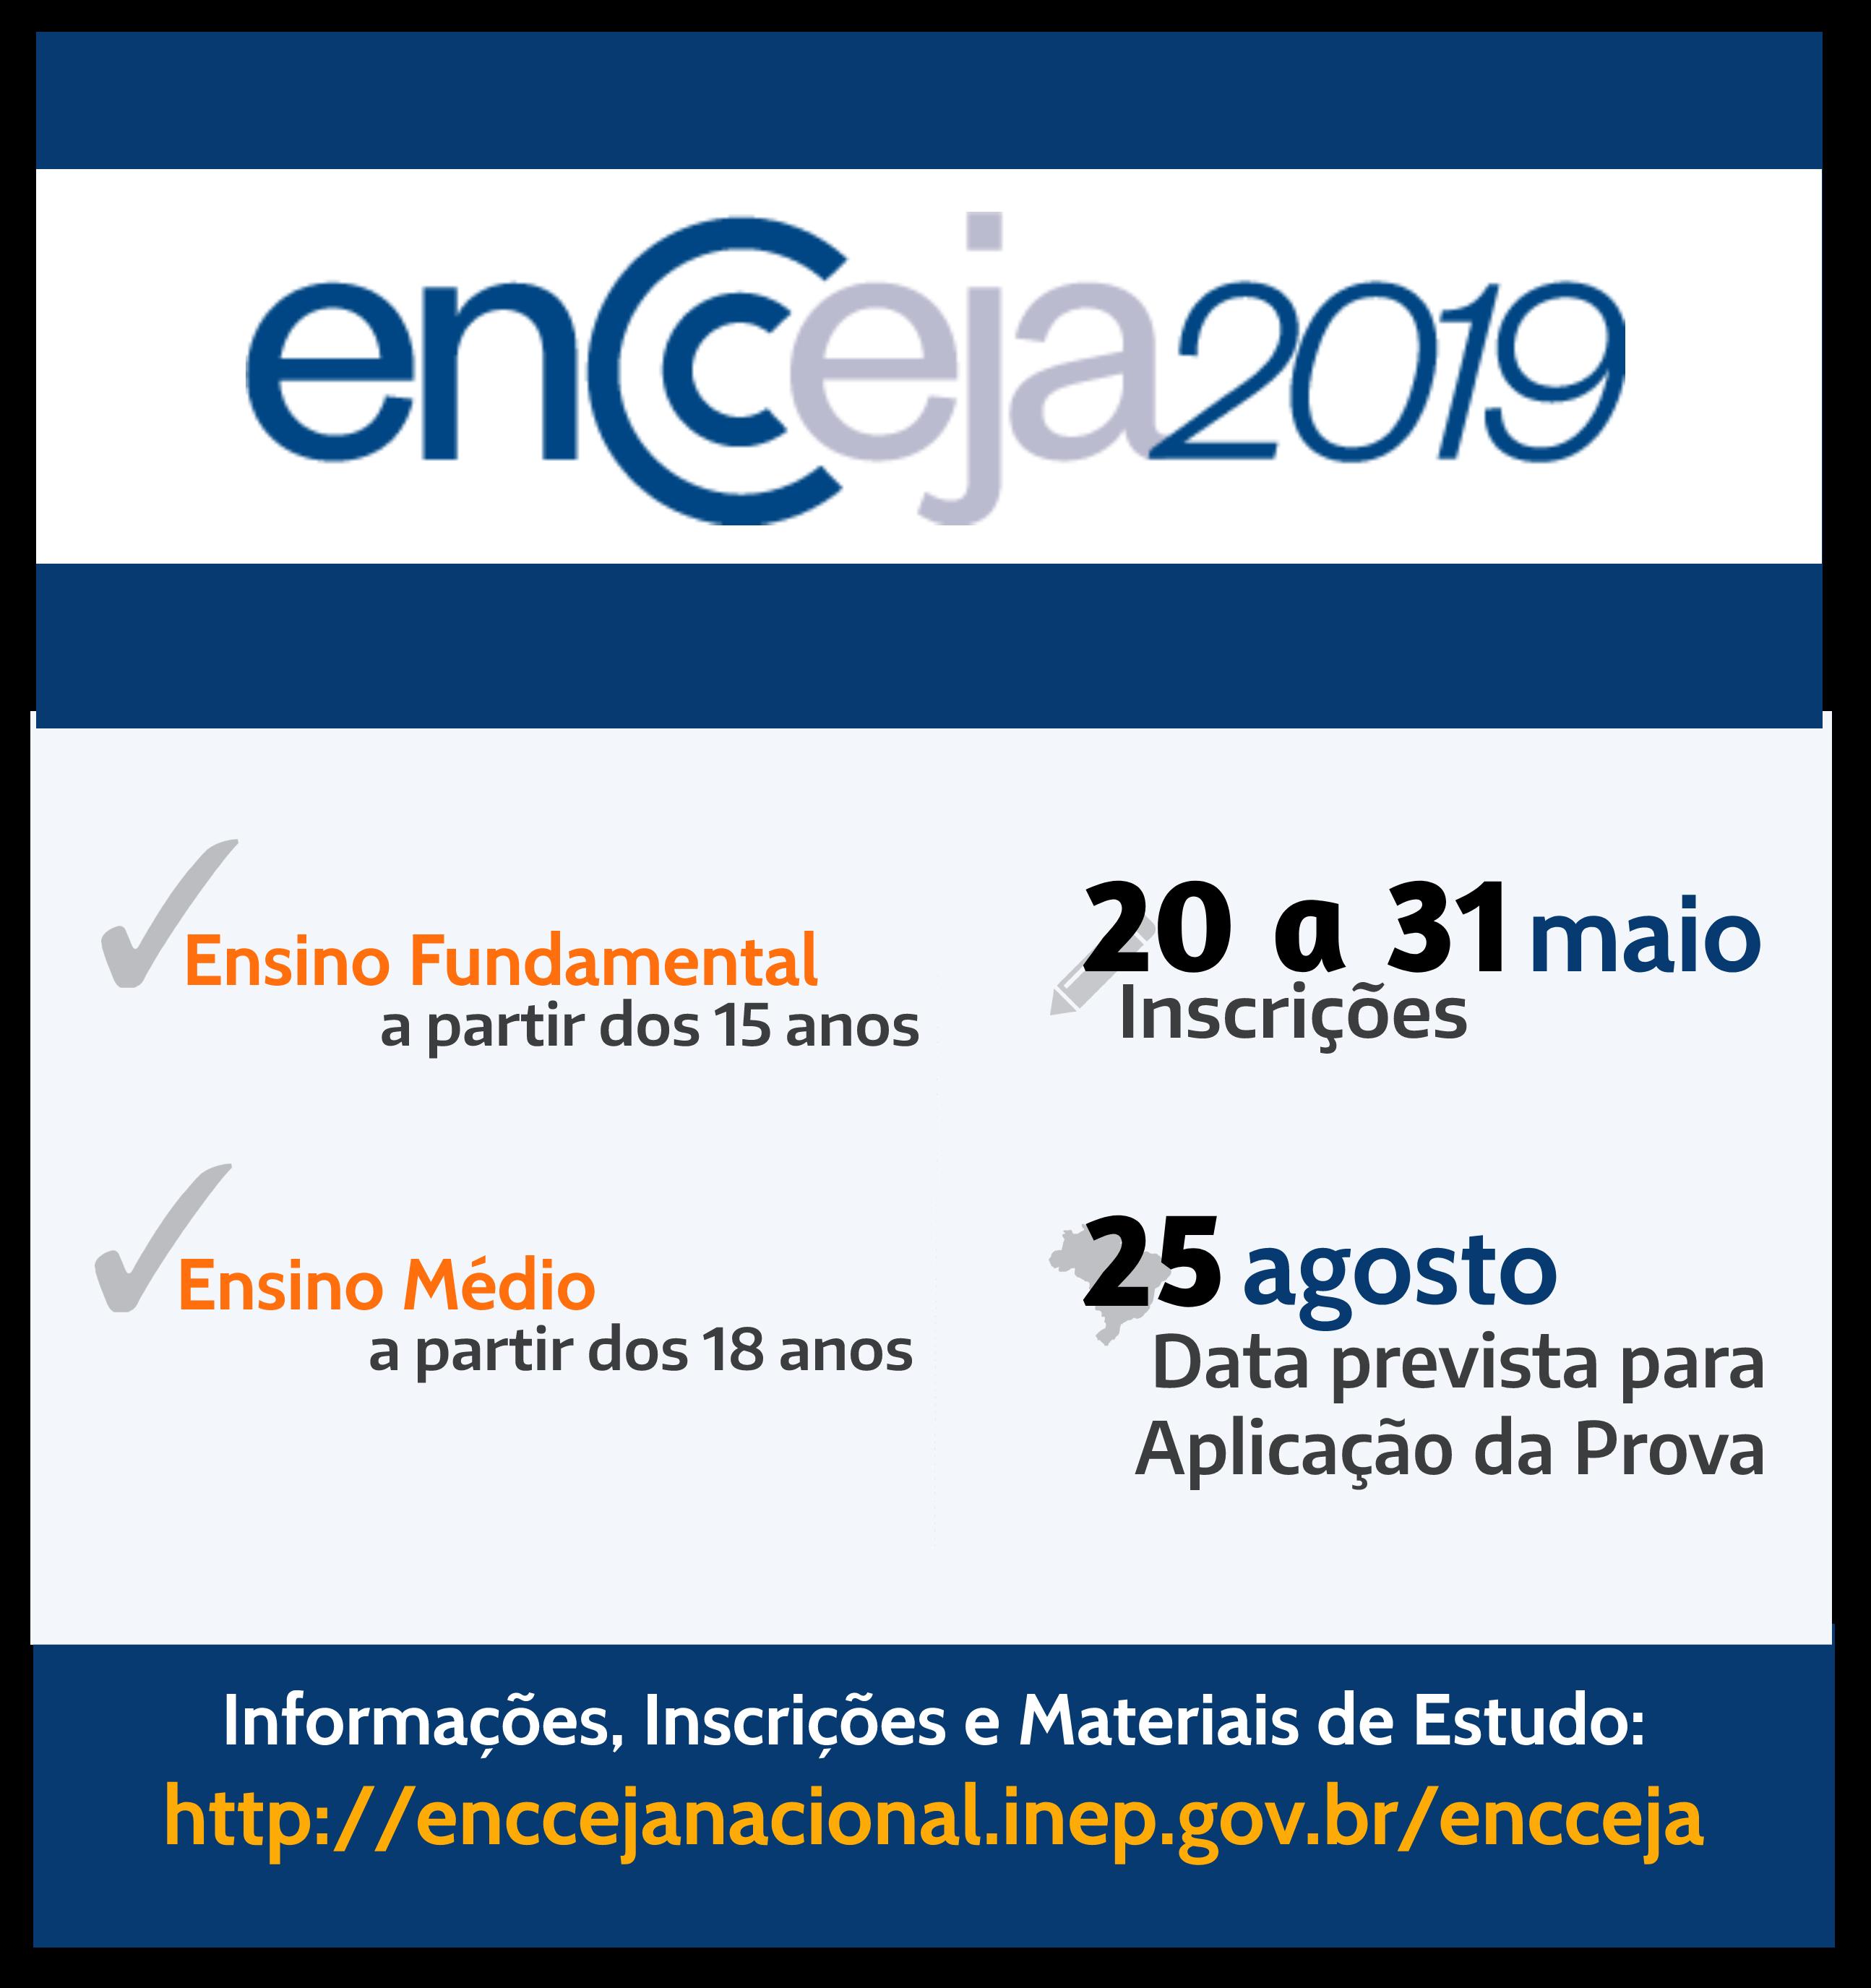 Encceja 2019 Informacoes Sobre Inscricoes Diretoria De Ensino Leste 3